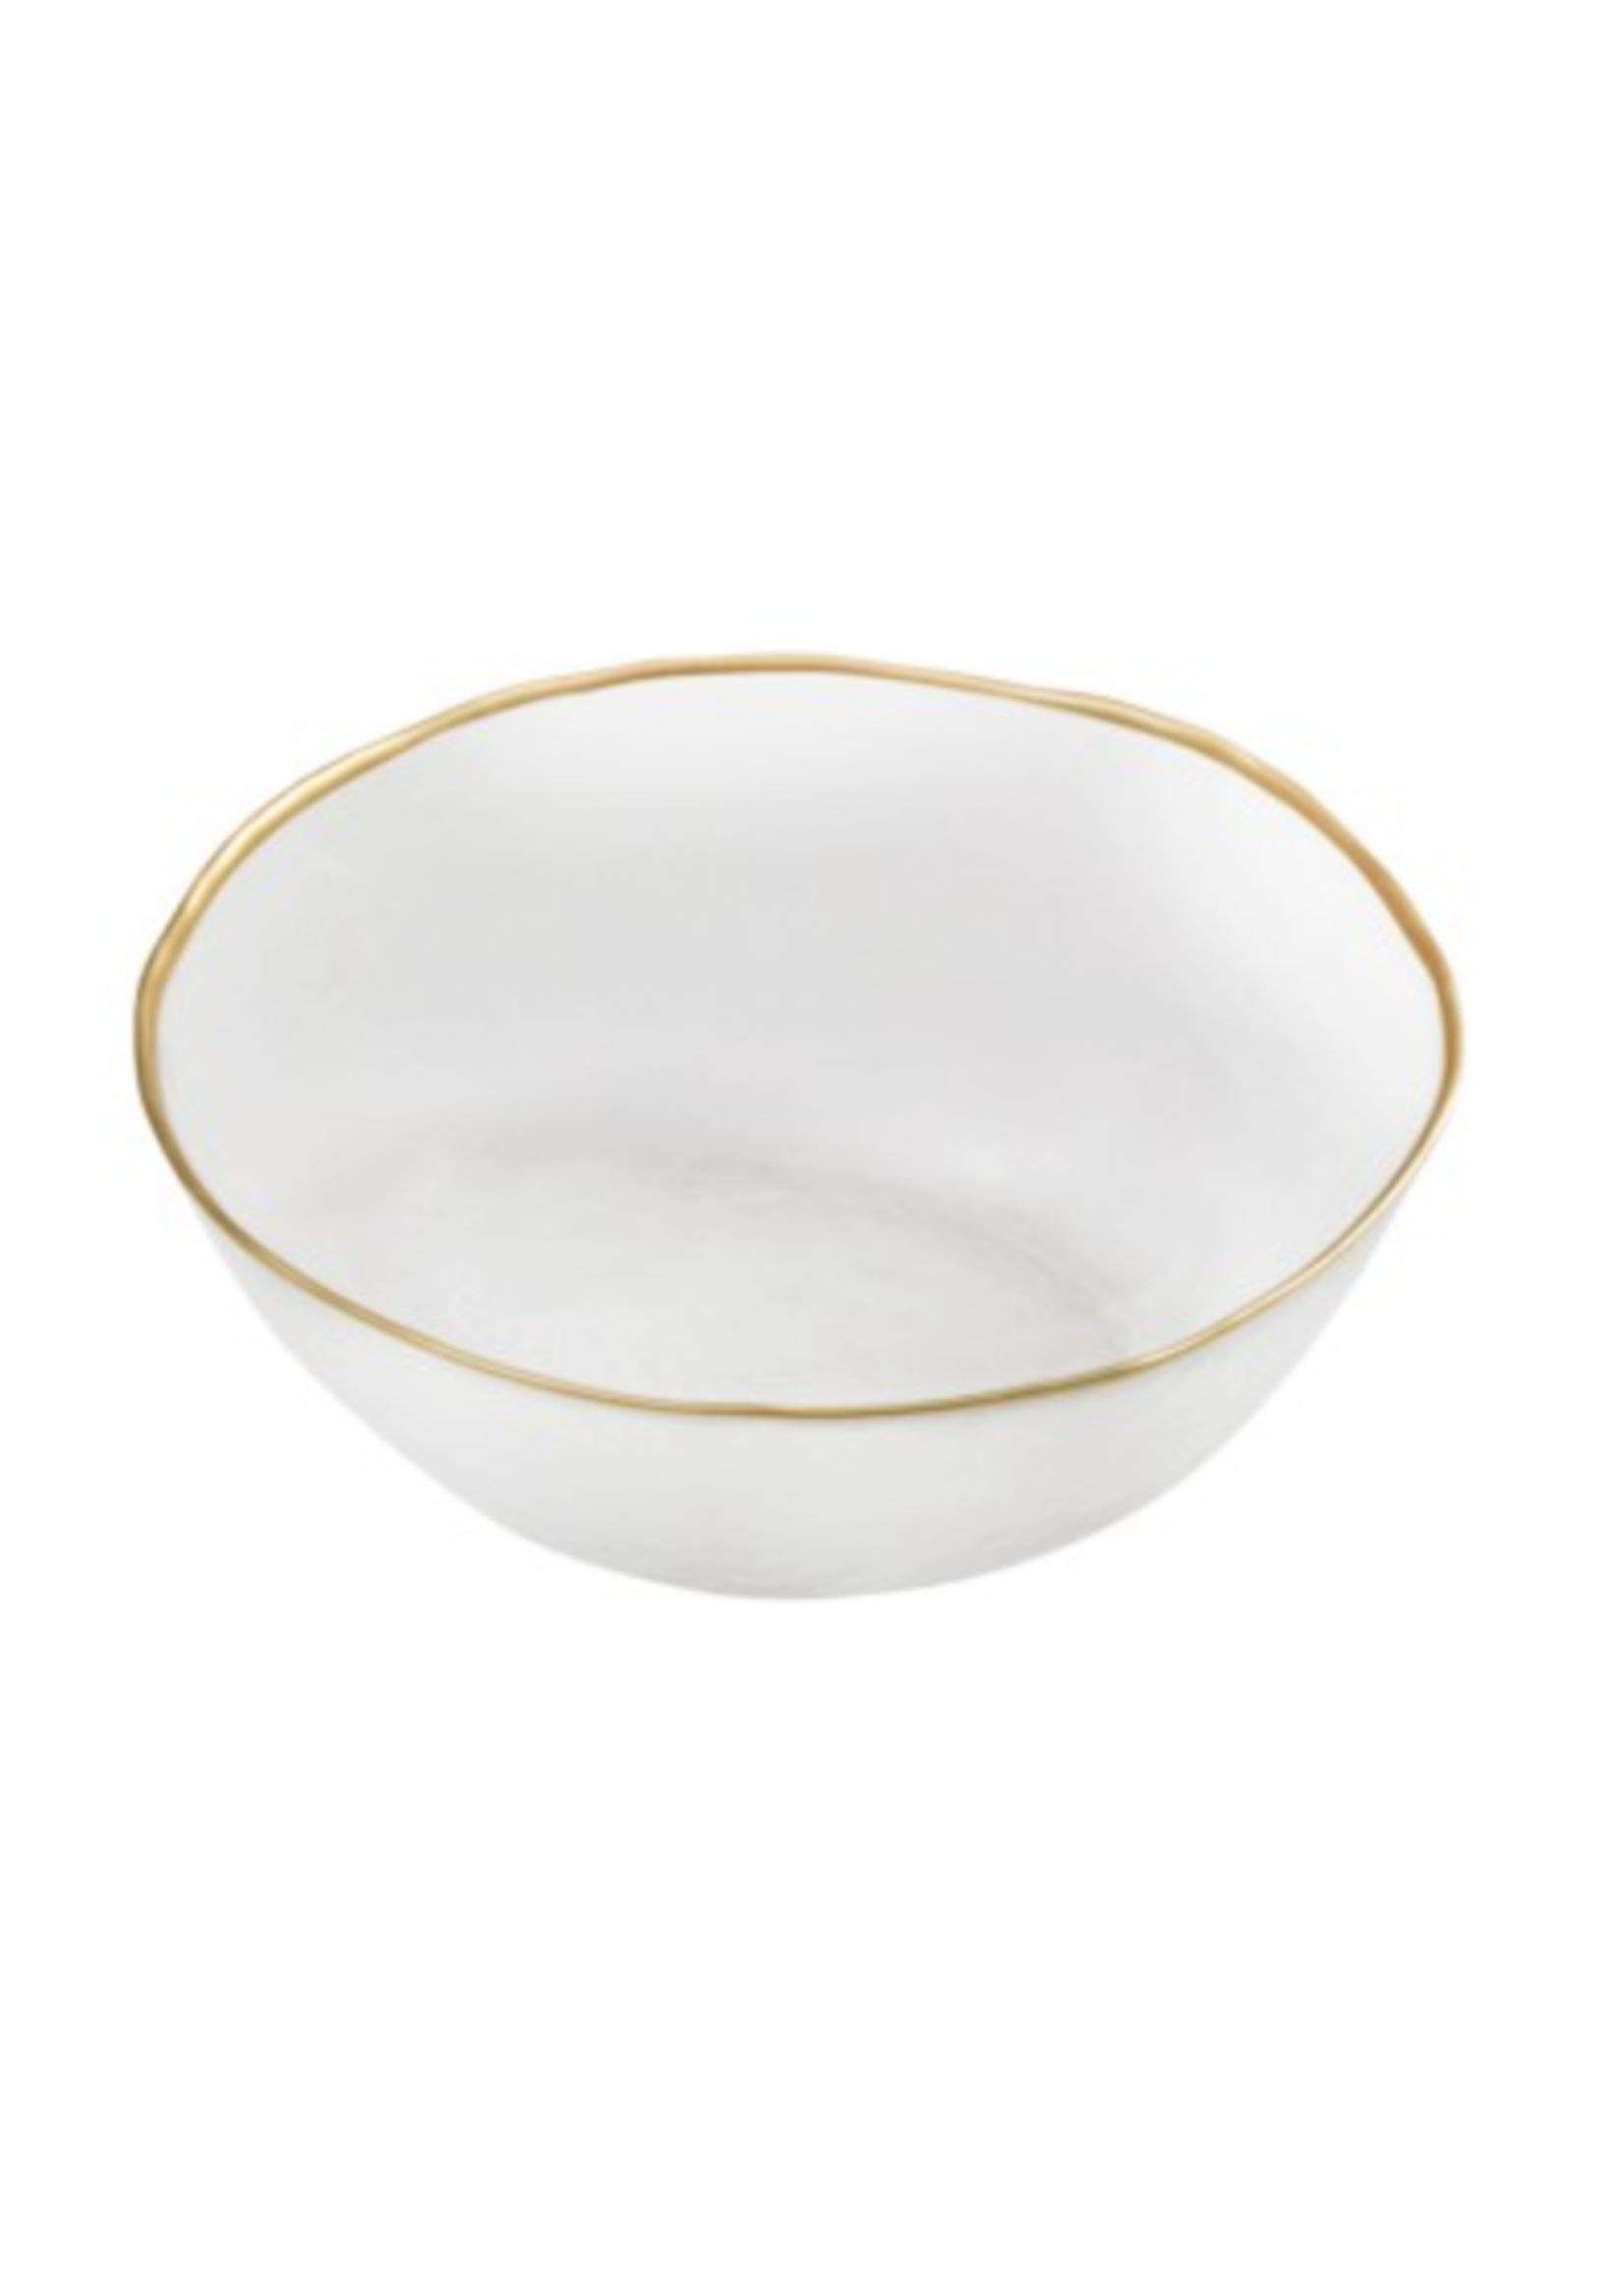 Clear Dessert Bowl w Gold Rim // Set of 4